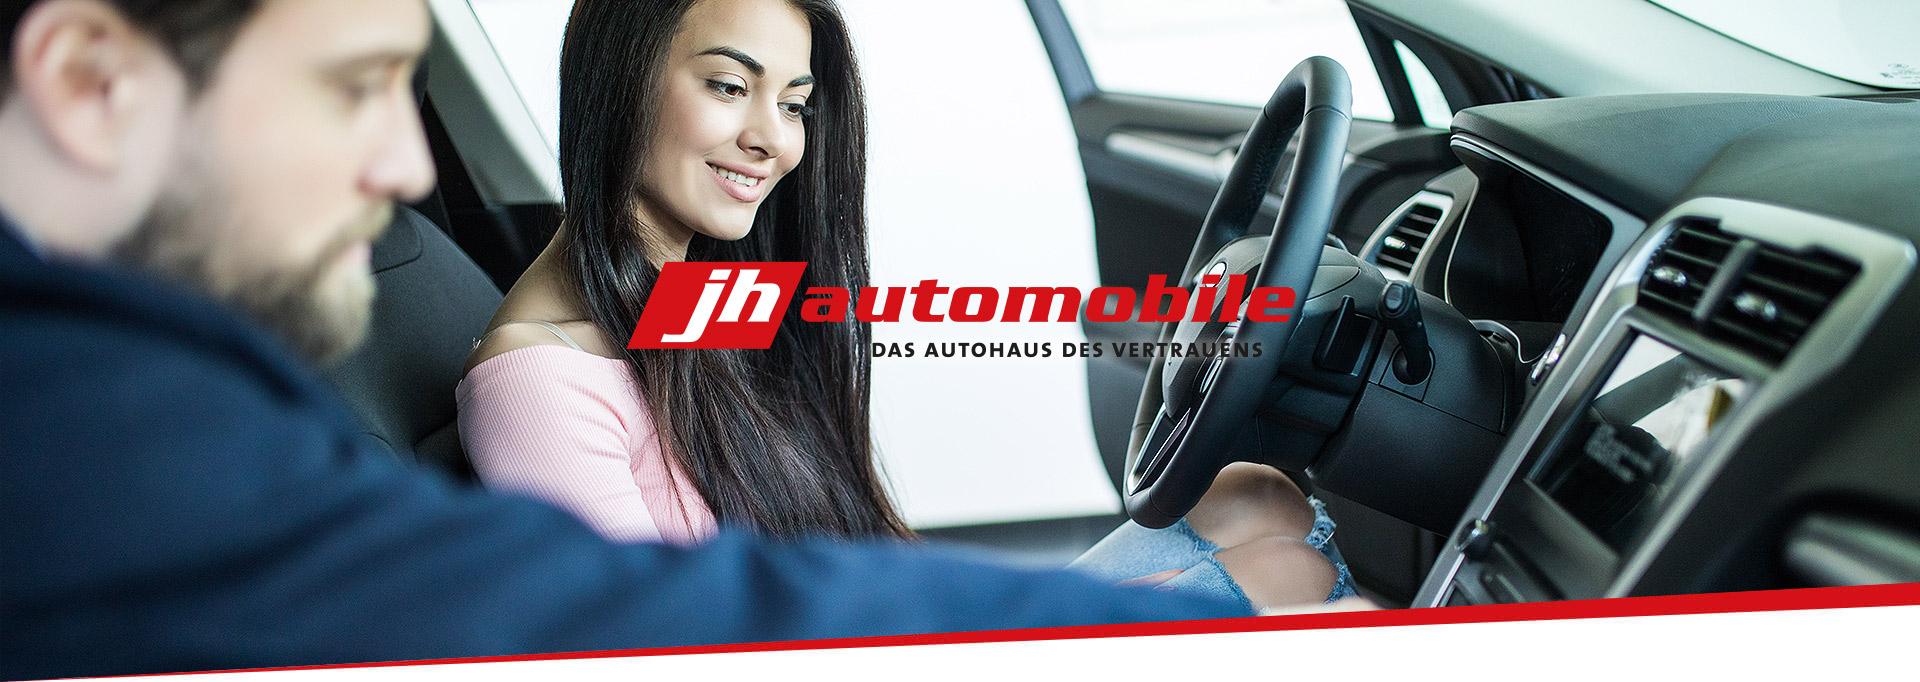 JH Automobile - Auto Ankaufstation Hannover Langenhagen